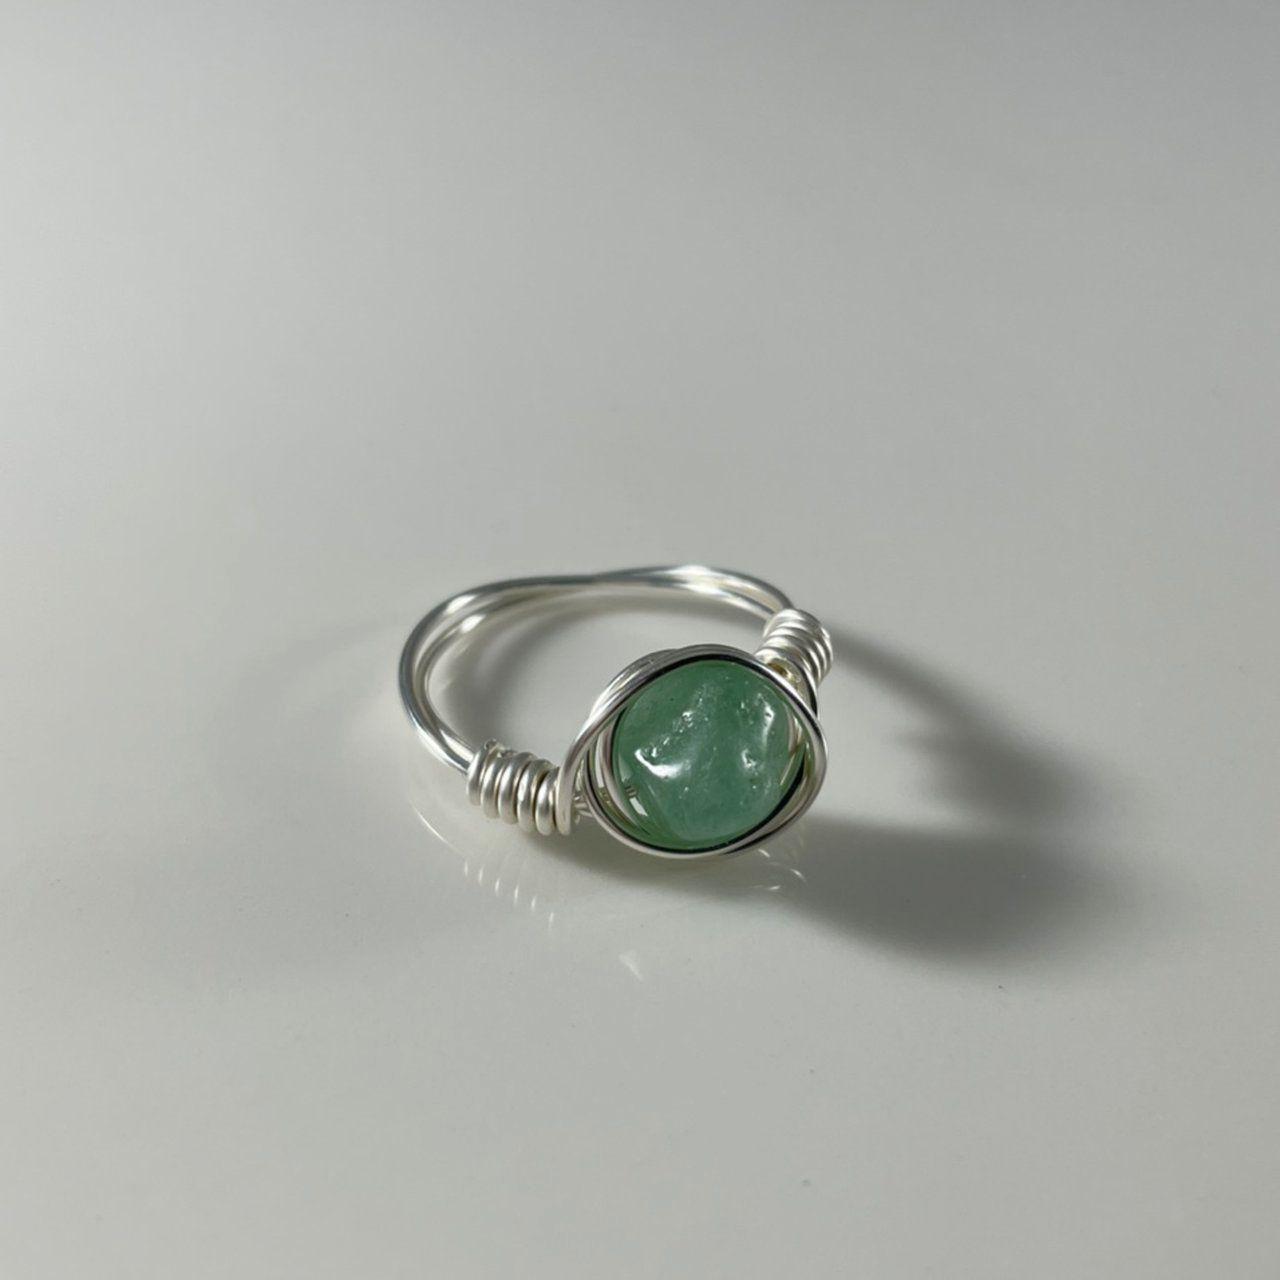 Crystal Rings Oval Jade Wire Wrapped Ring Statement Gemstone Rings Handmade Rings